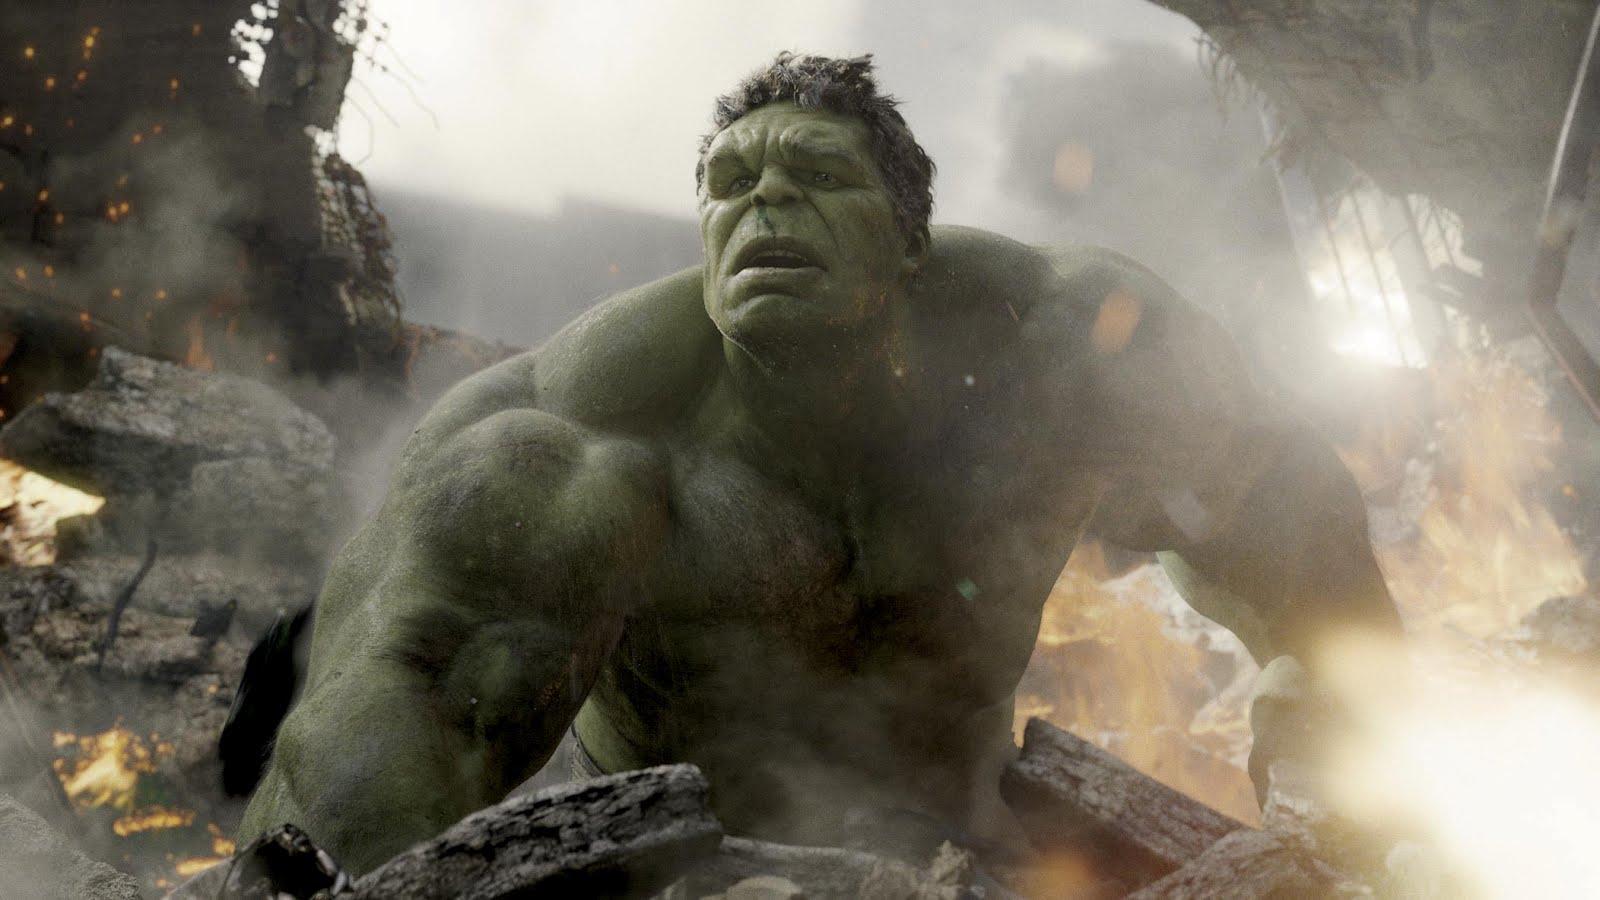 http://3.bp.blogspot.com/-Z_eOZ02XNoA/T4gsMPC0DvI/AAAAAAAAAL8/OLiAs2gq2c4/s1600/Marvels-The_Avengers%2B%25284%2529.jpg